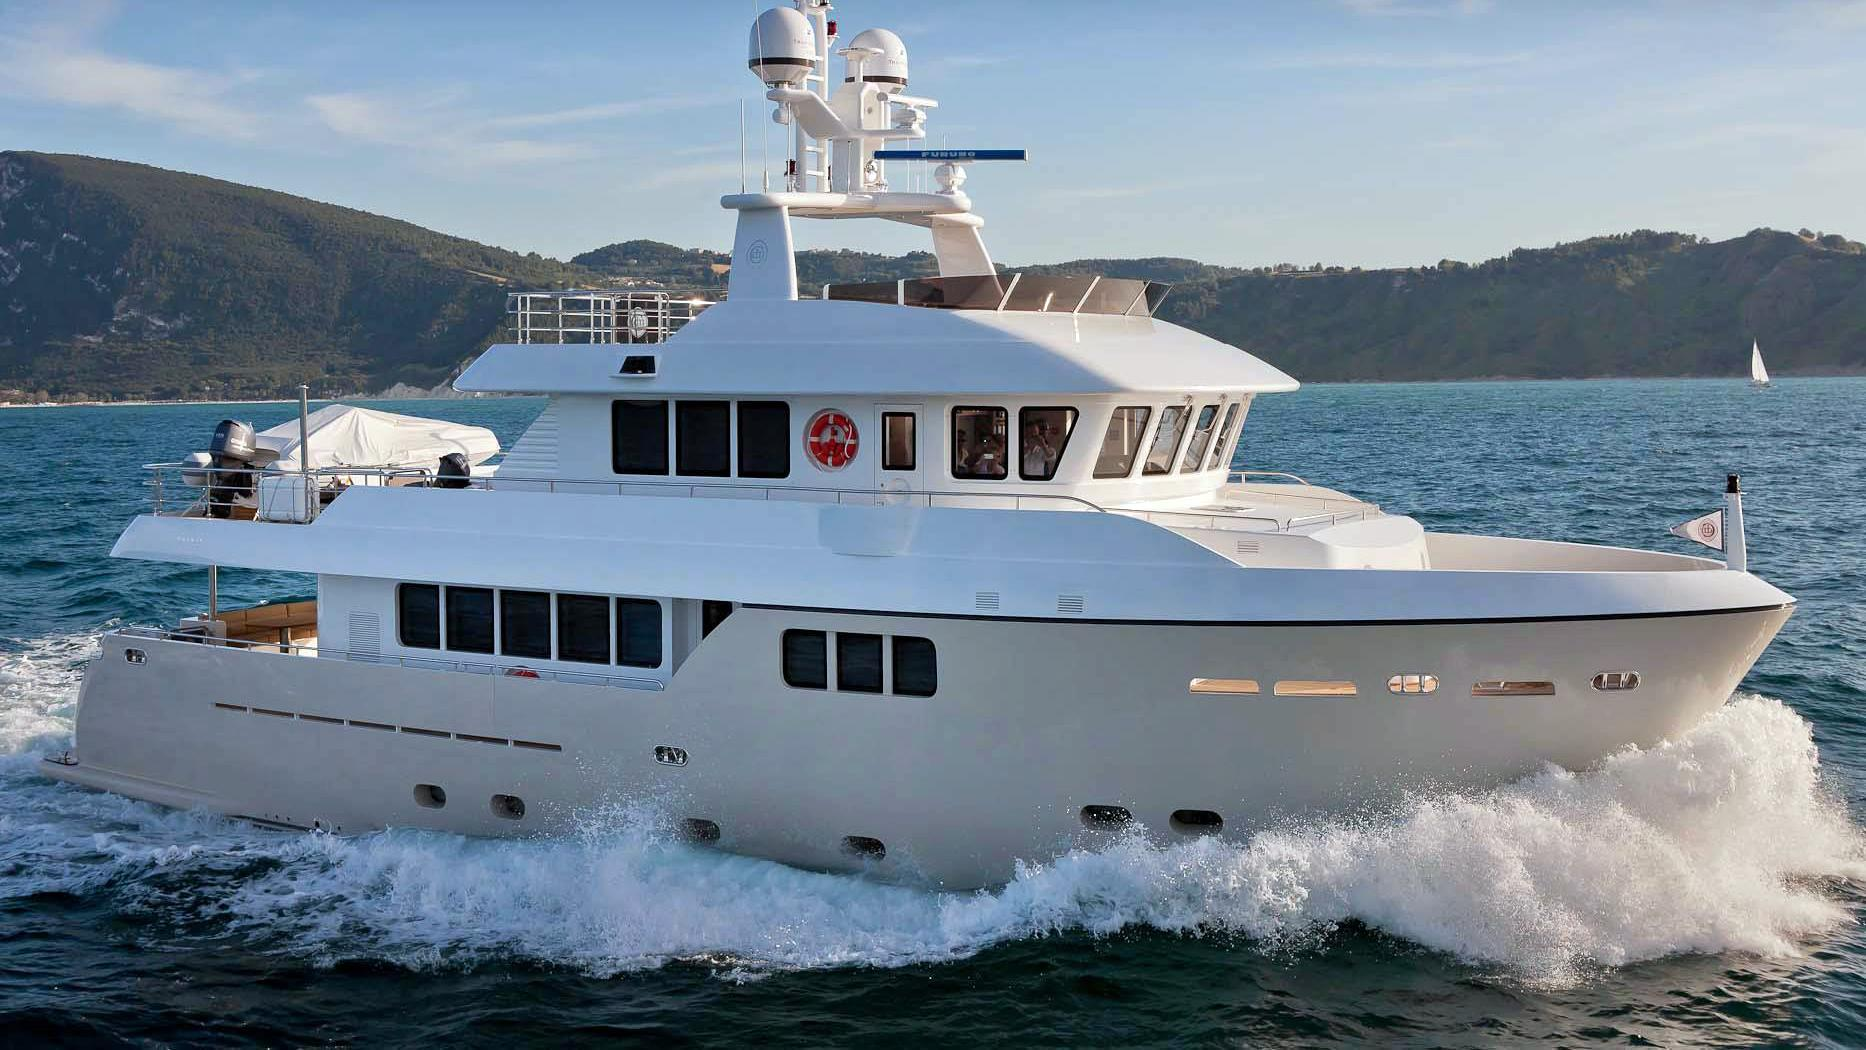 percheron-motor-yacht-cantiere-delle-marche-darwin-86-2012-26m-cruising